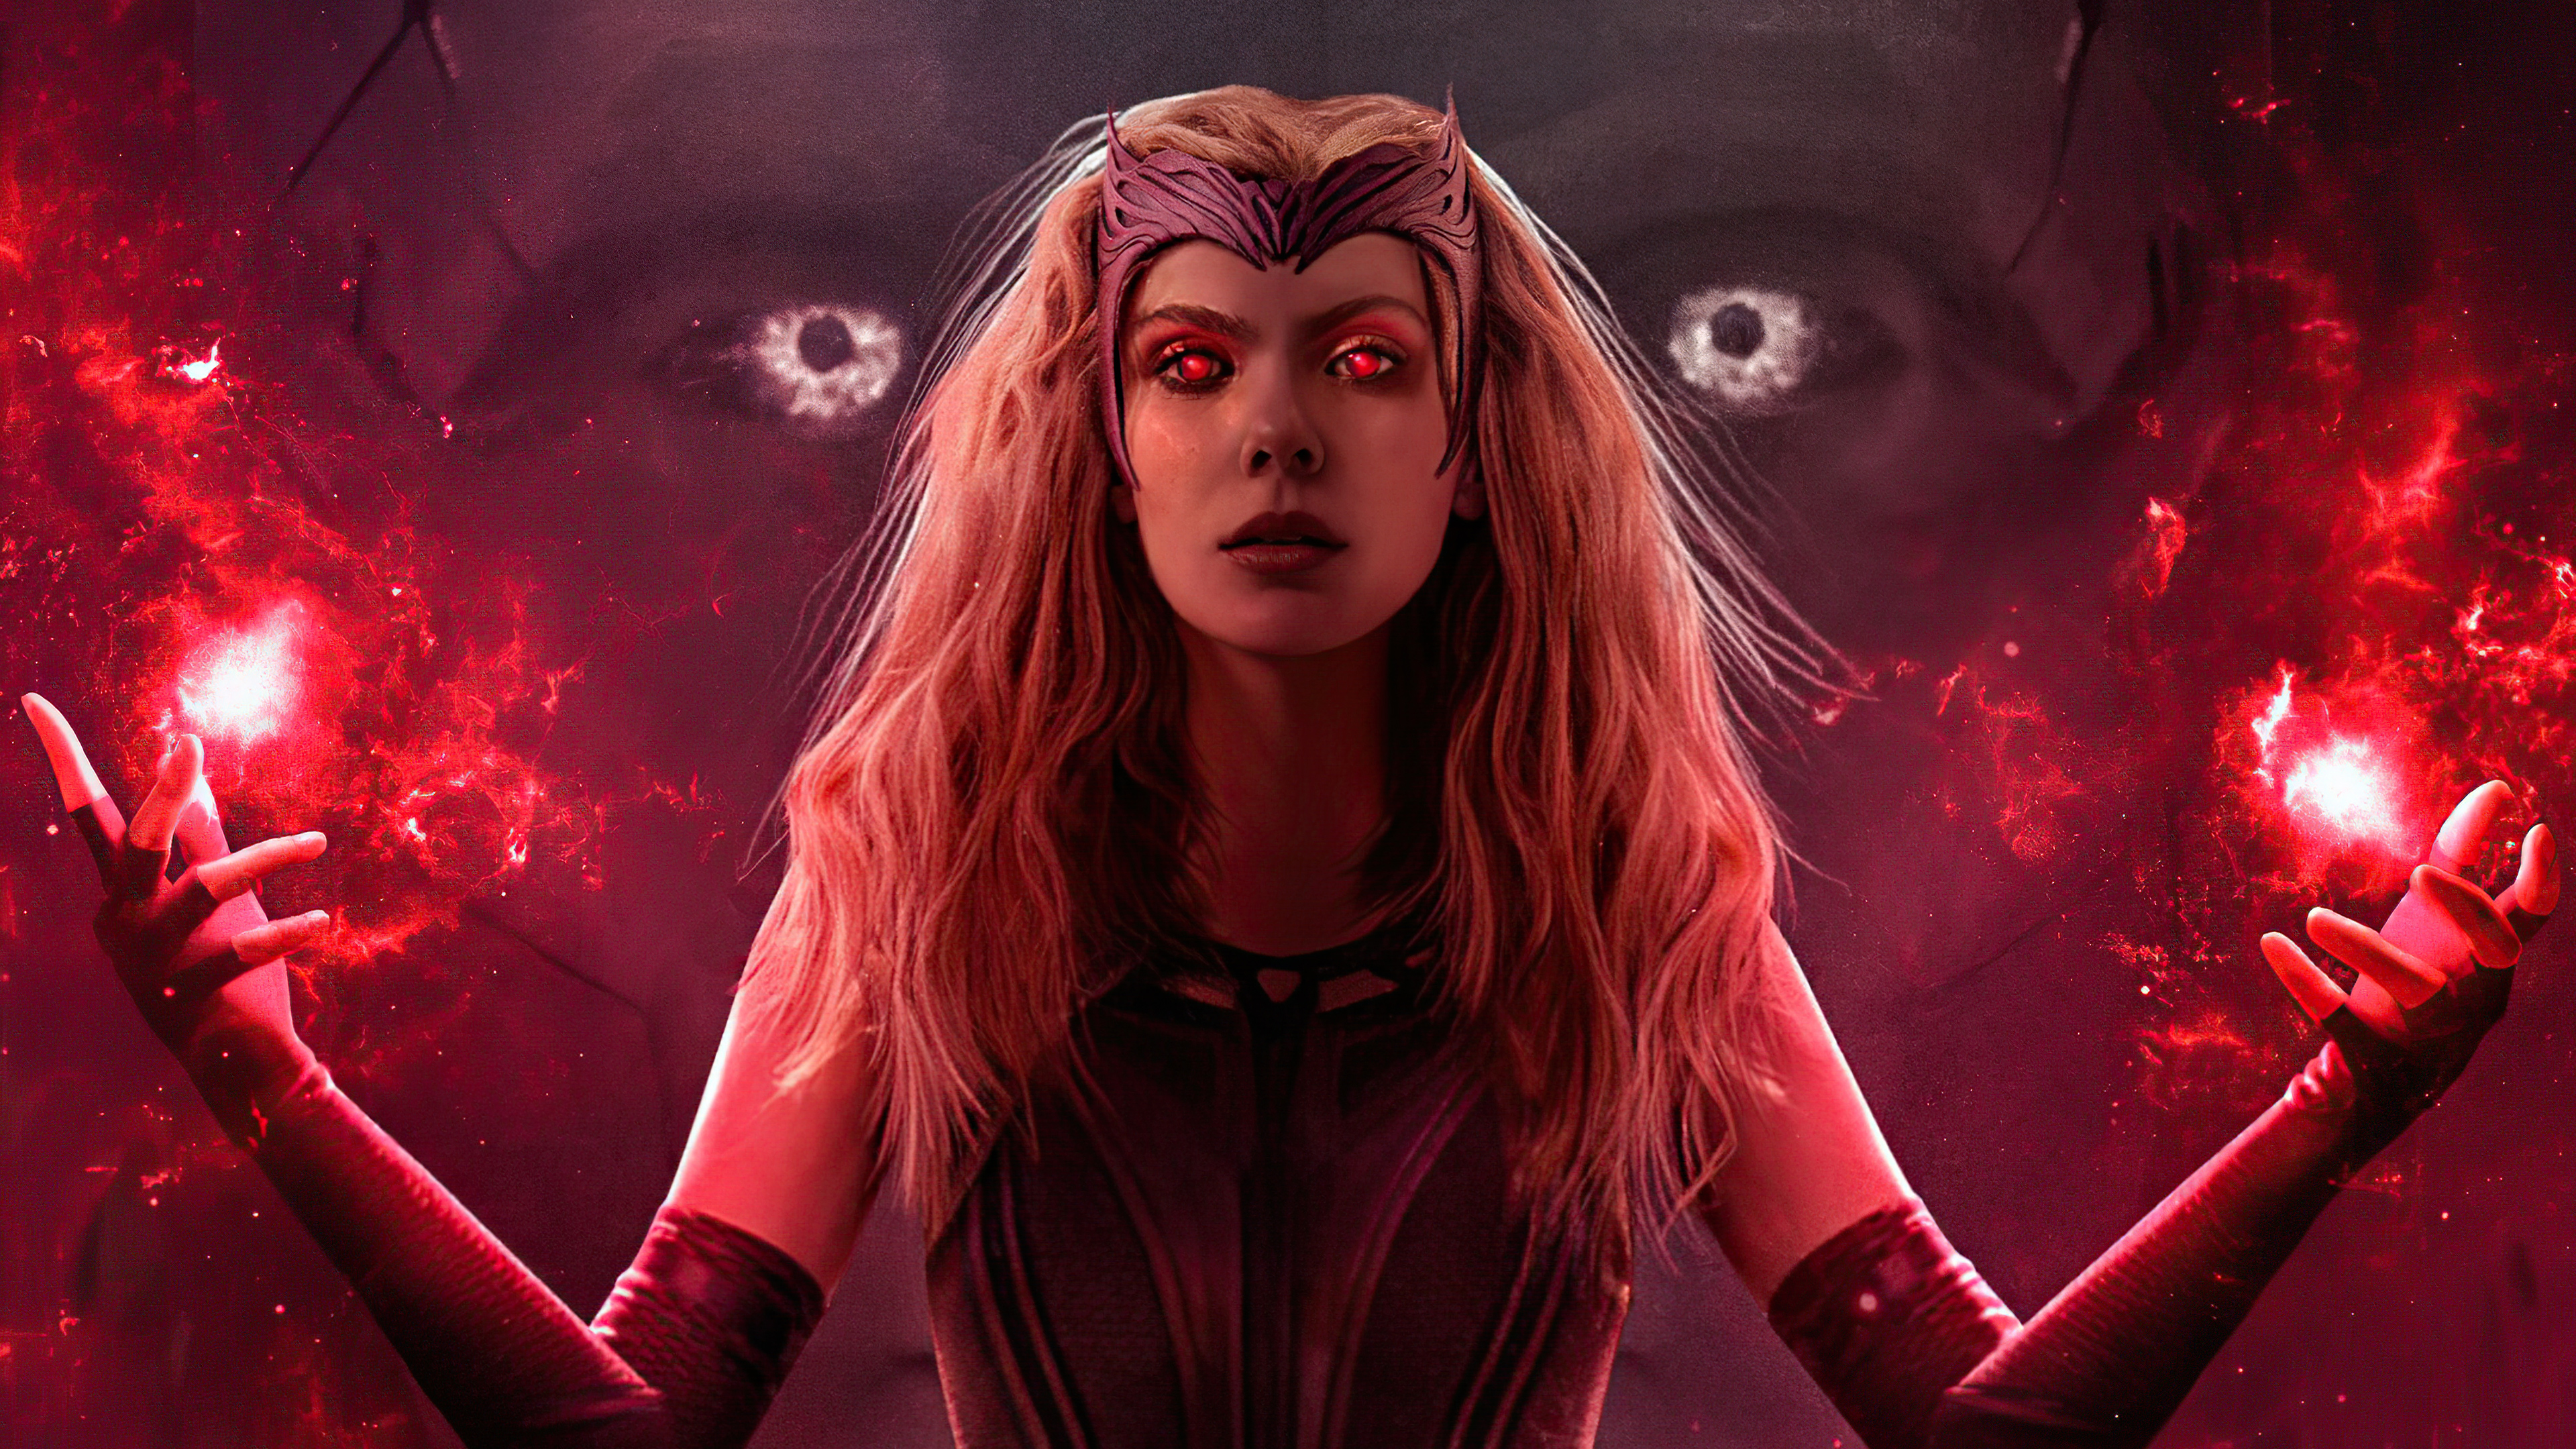 scarlet witch aka wanda vision 4k 1626910967 - Scarlet Witch Aka Wanda Vision 4k - Scarlet Witch Aka Wanda Vision 4k wallpapers